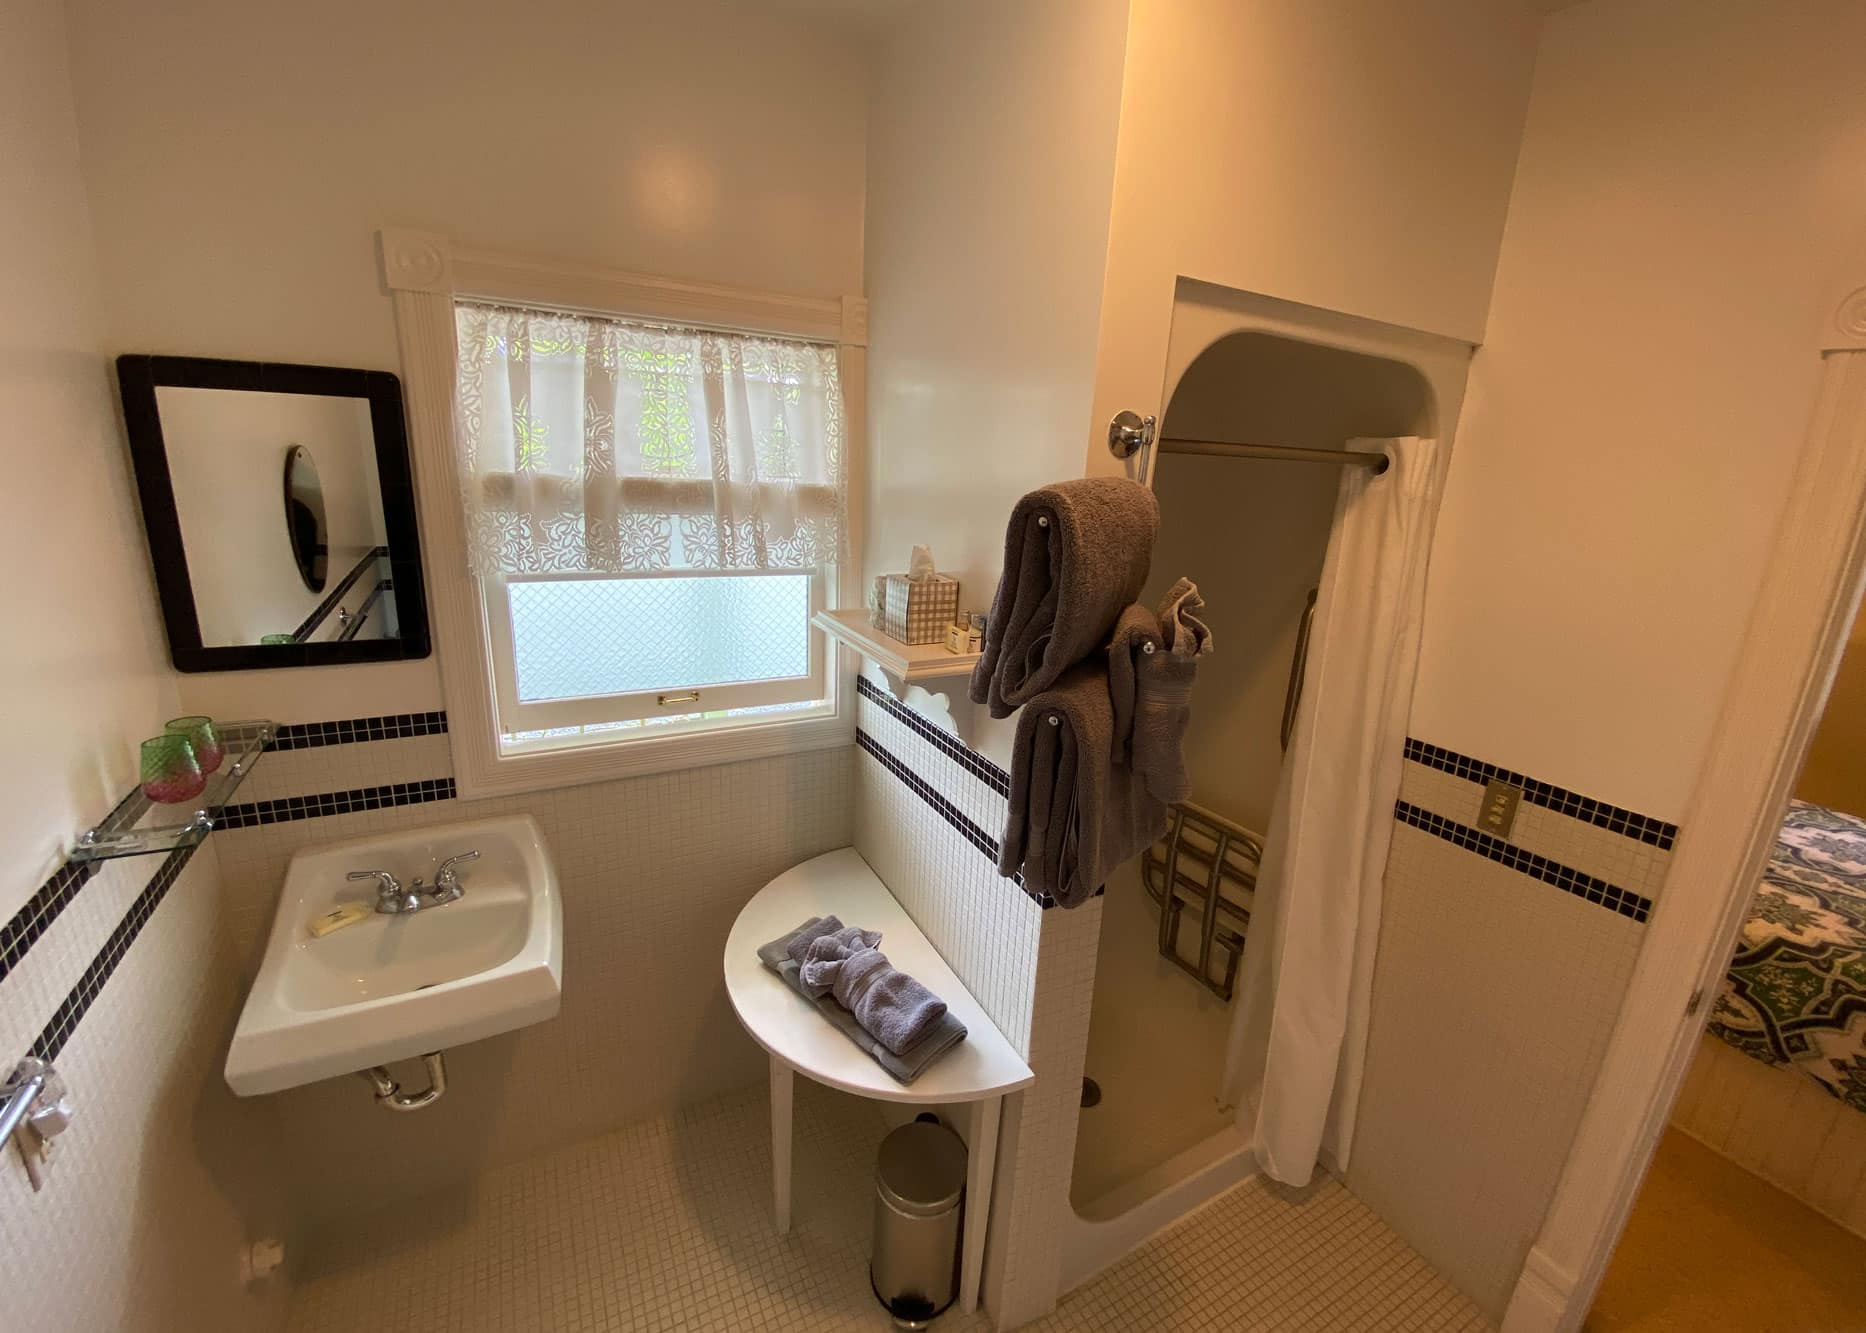 the-edenwild-inn-lopez-island-lodging-2020-room-03-03